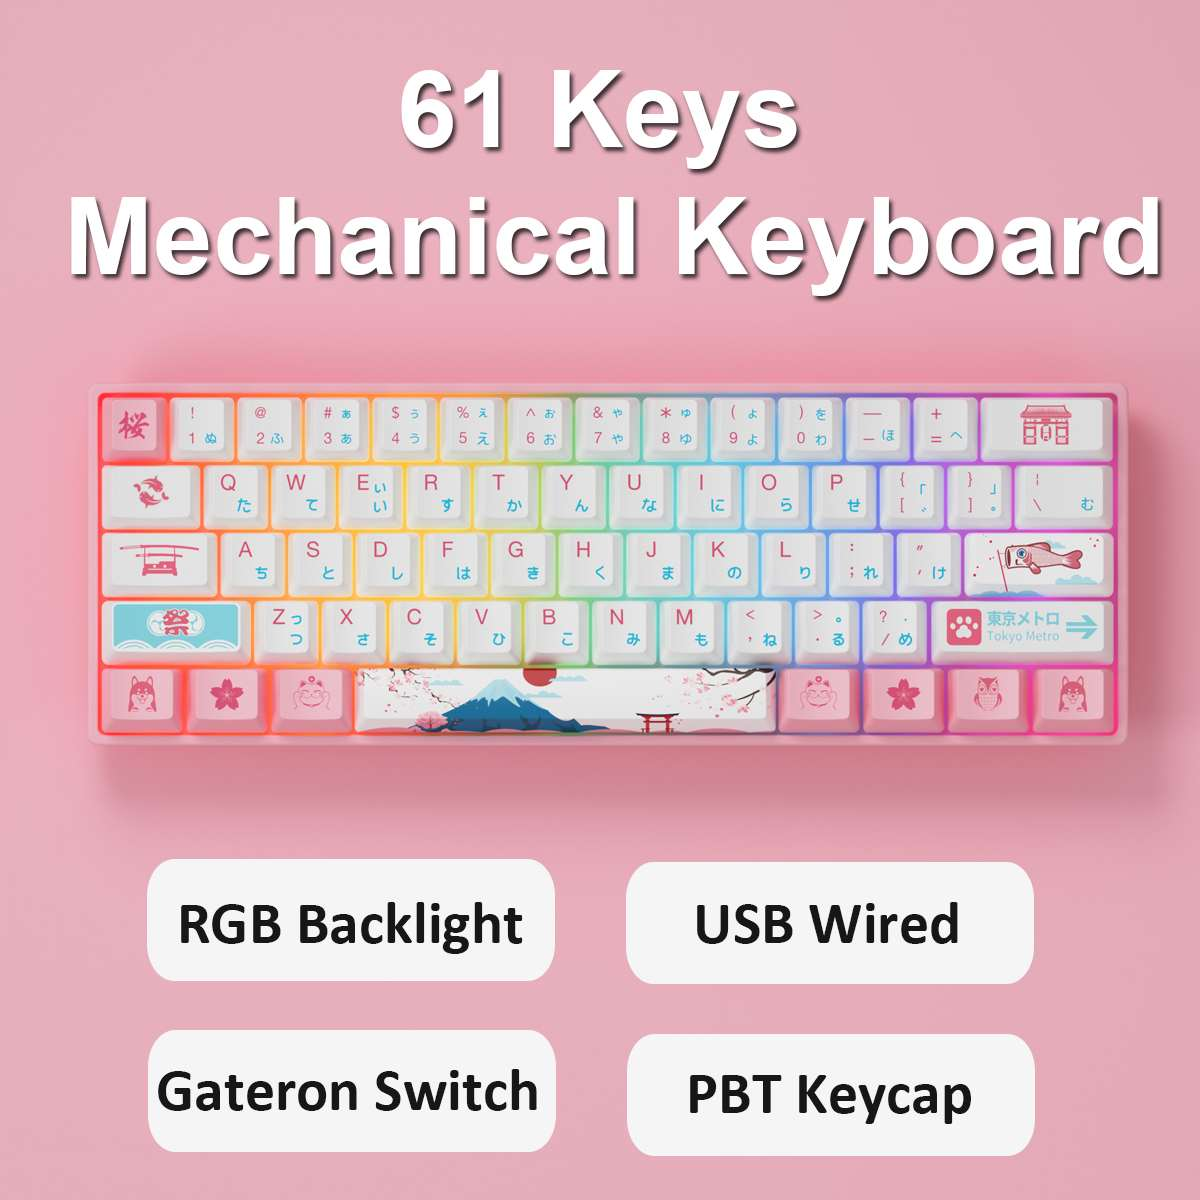 AKKO 3061 R2 طوكيو 61 مفاتيح لوحة المفاتيح الميكانيكية ساكورا الوردي اليابانية RGB PBT كيكابس NKRO Gateron مفاتيح السلكية لوحة مفاتيح الألعاب